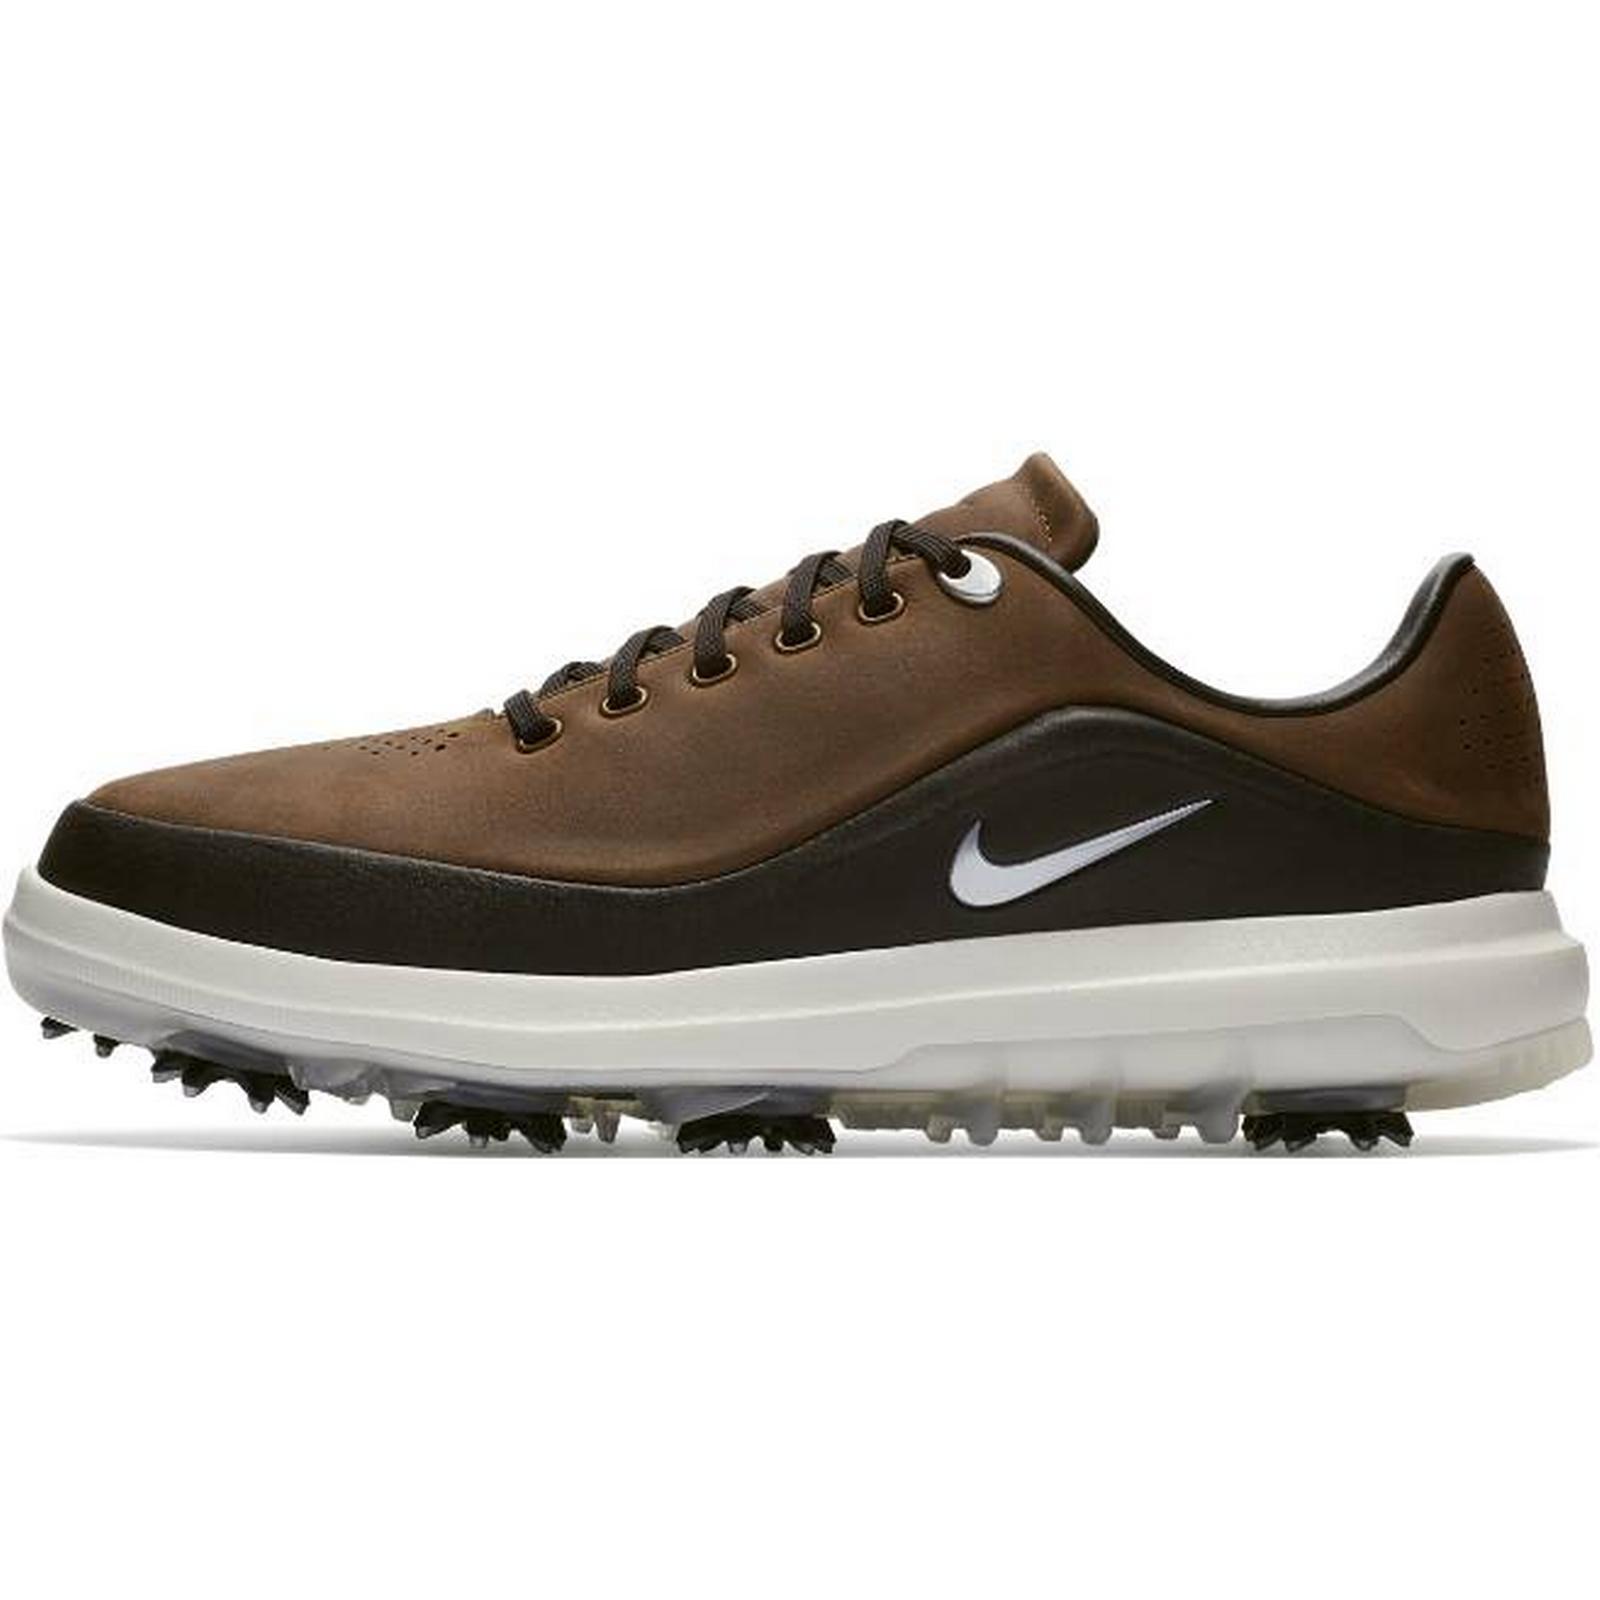 Mr/Ms-NIKE Męskie Buty Do Precision-Reasonable Golfa Nike Air Zoom Precision-Reasonable Do Price 0a3aa2